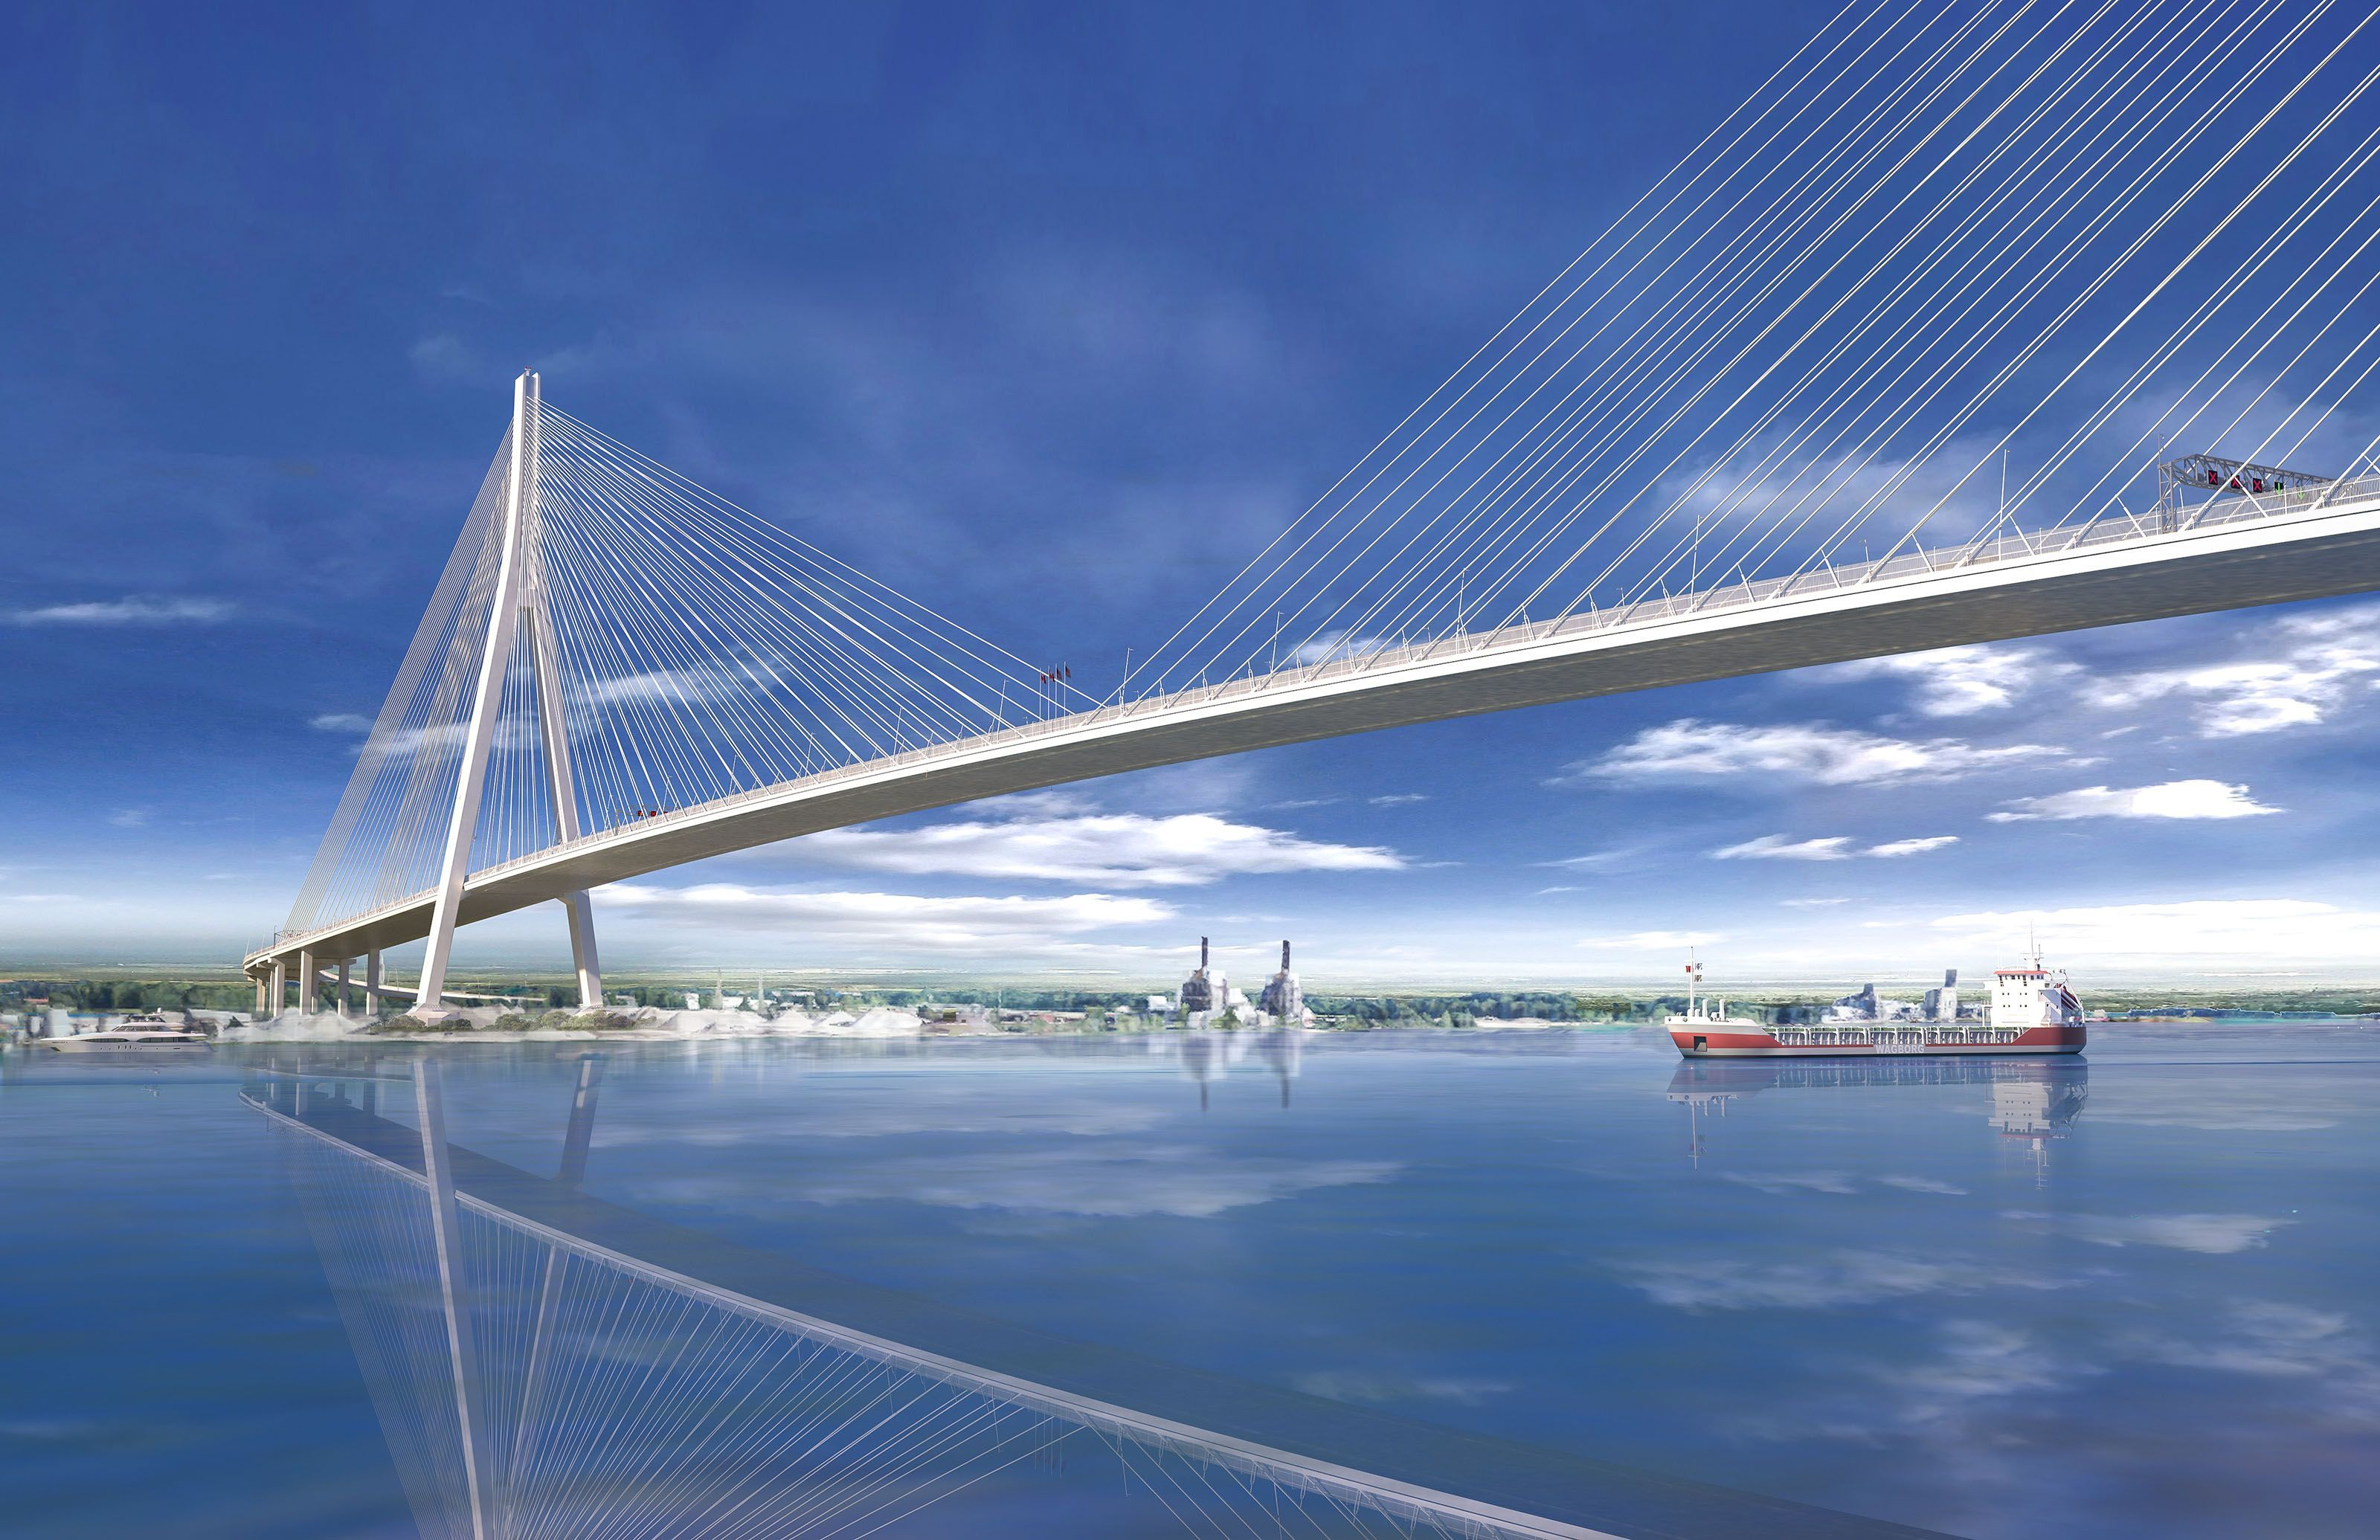 Michigan Supreme Court denies Moroun appeal on new bridge